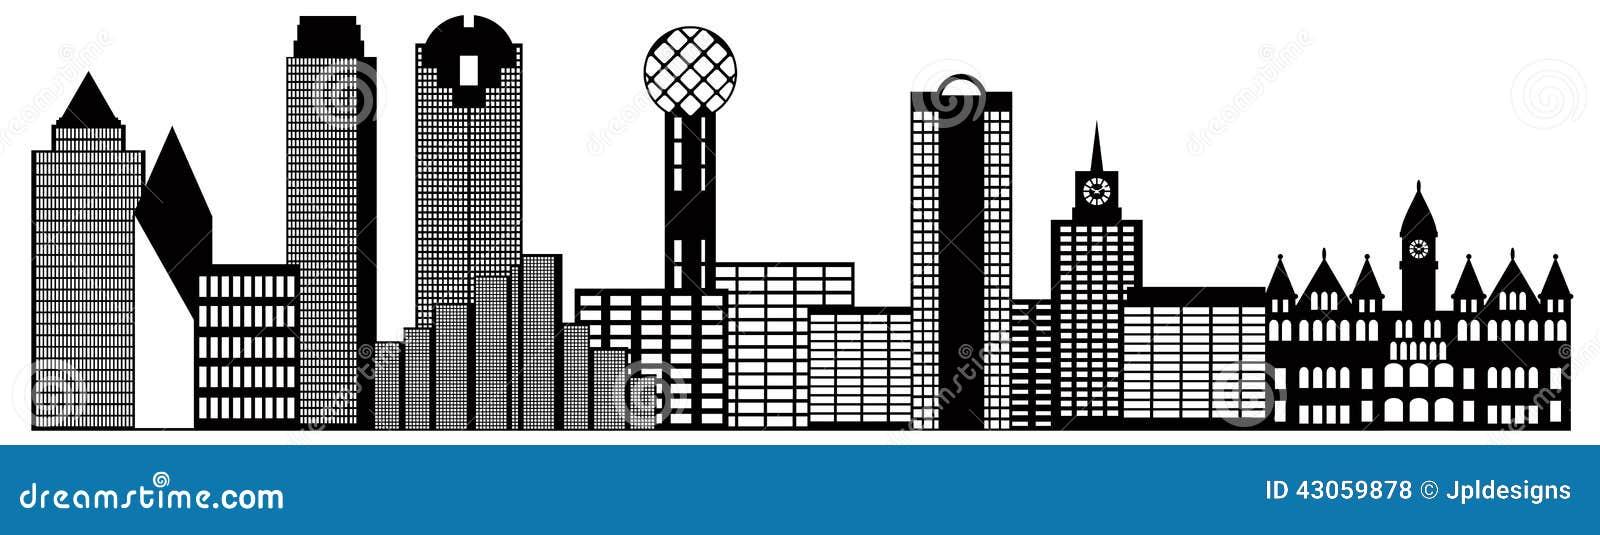 Dallas Skyline Black Outline 92